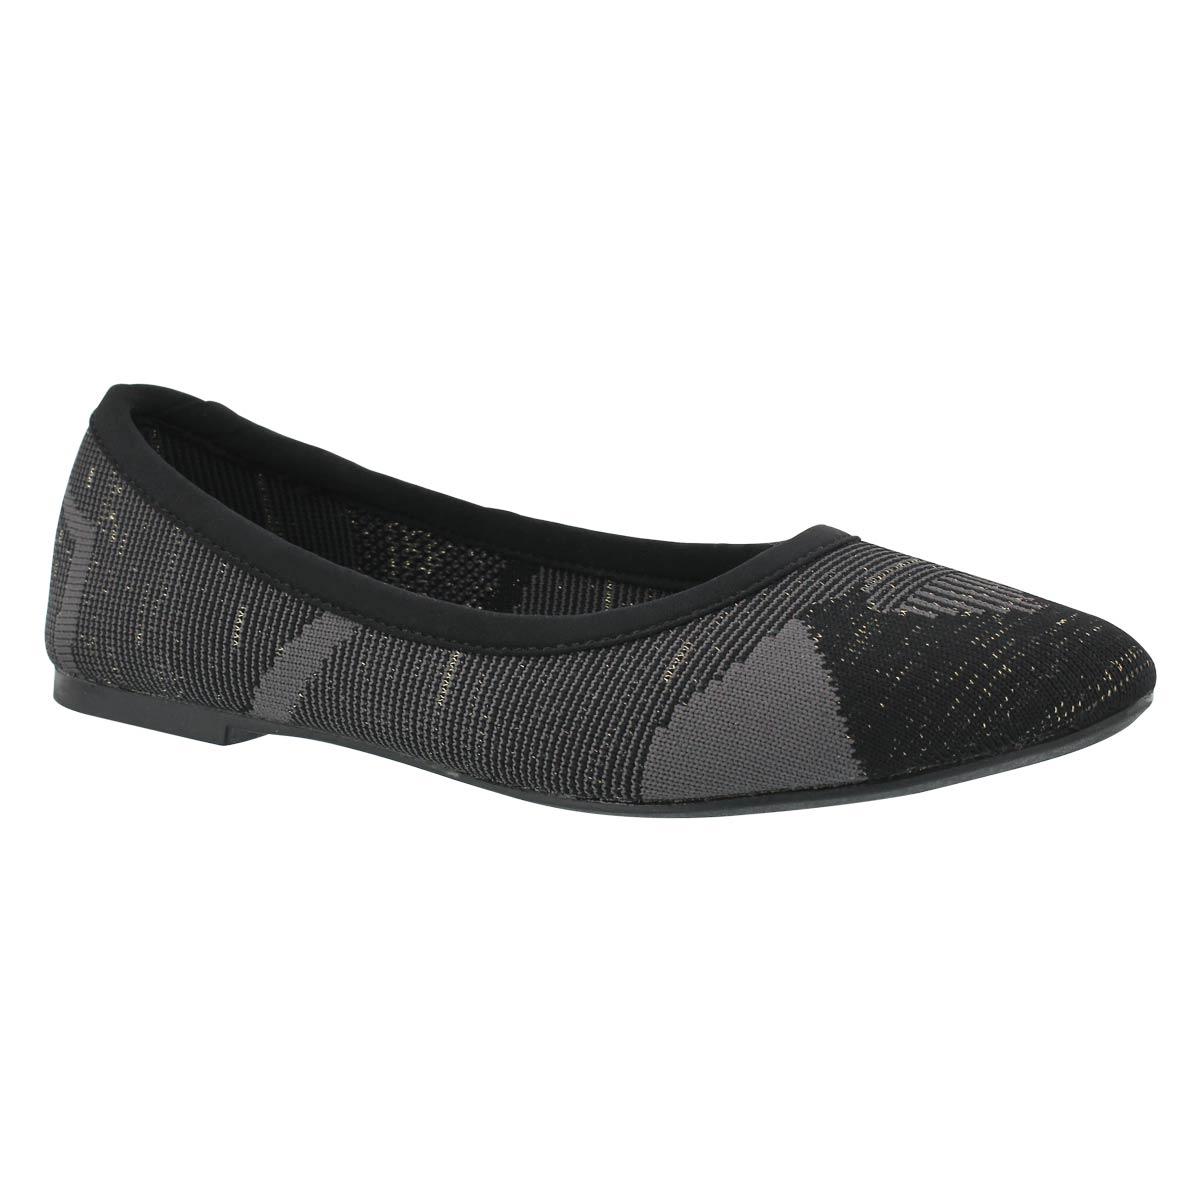 Women's CLEO BLITZ black/grey casual flats